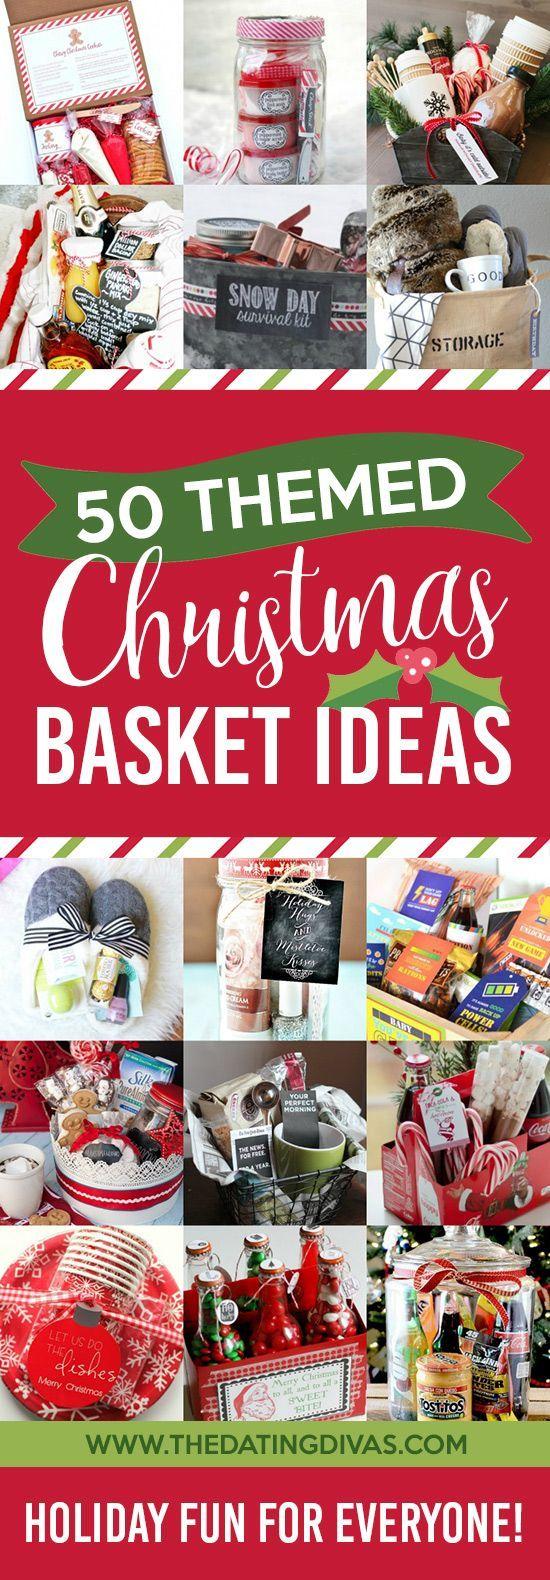 themed christmas basket ideas regalitos ideas pinterest